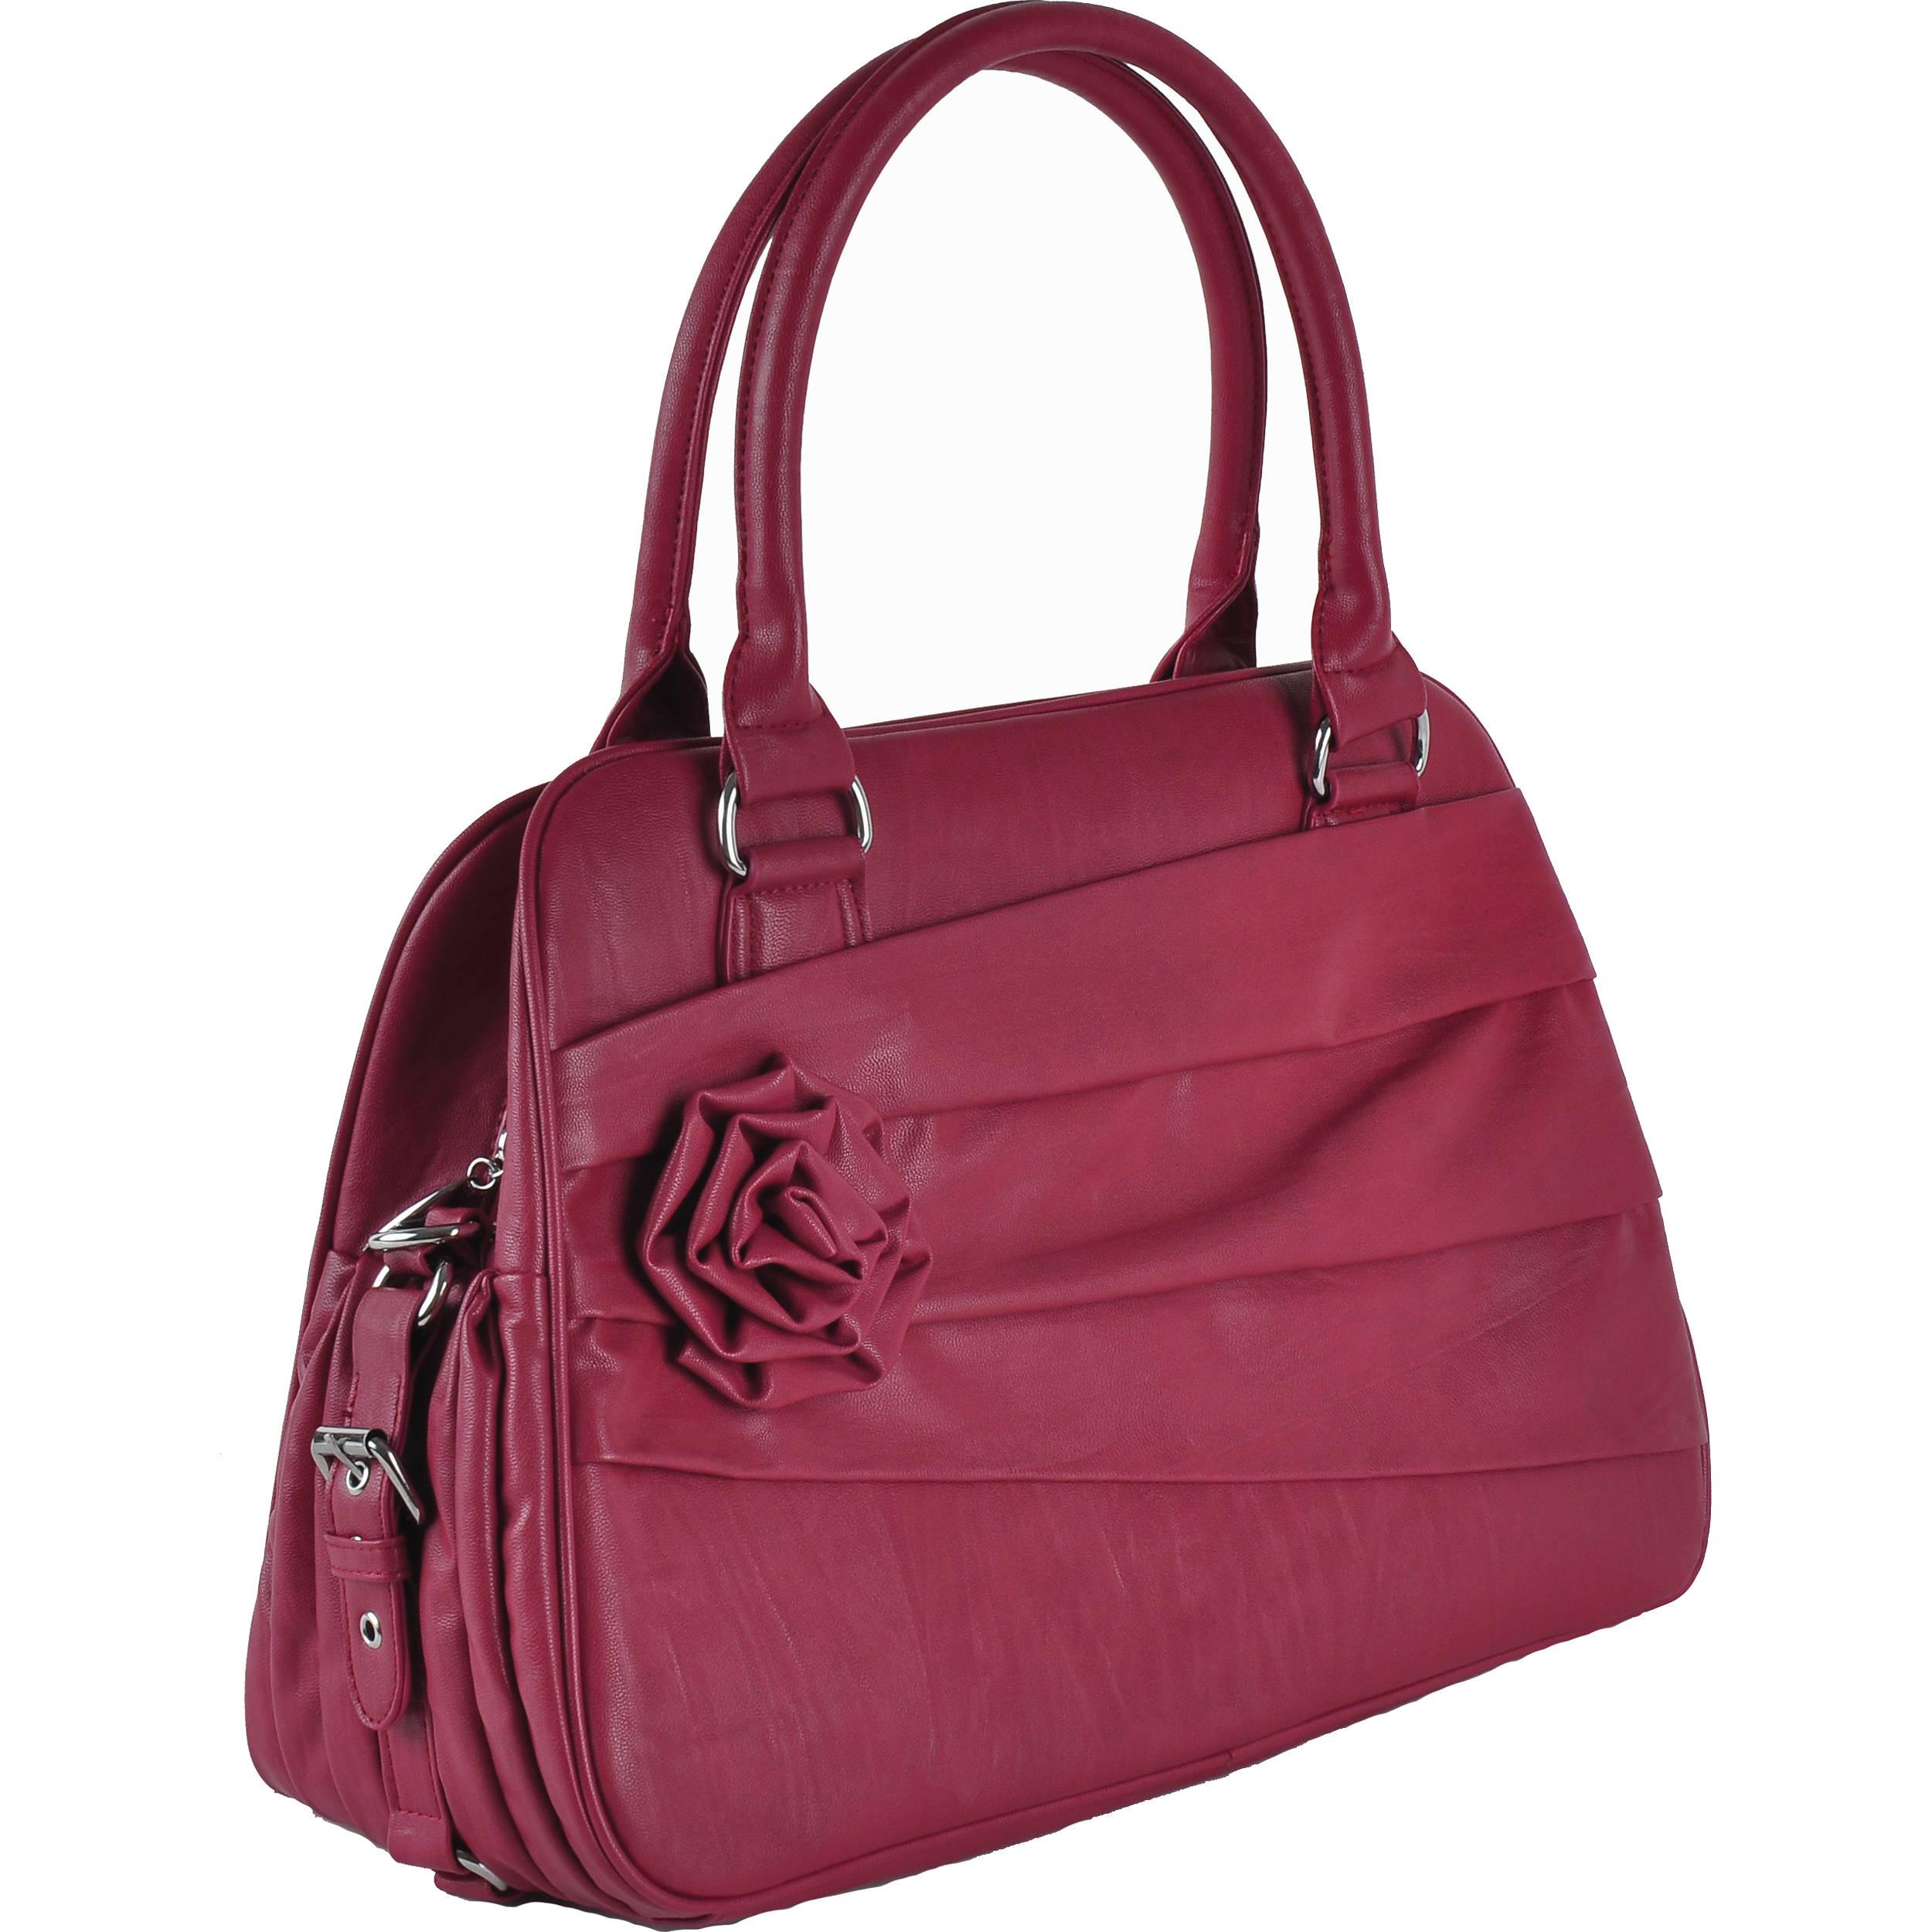 47a628d1136 Jo Totes Rose Camera Bag (Raspberry)